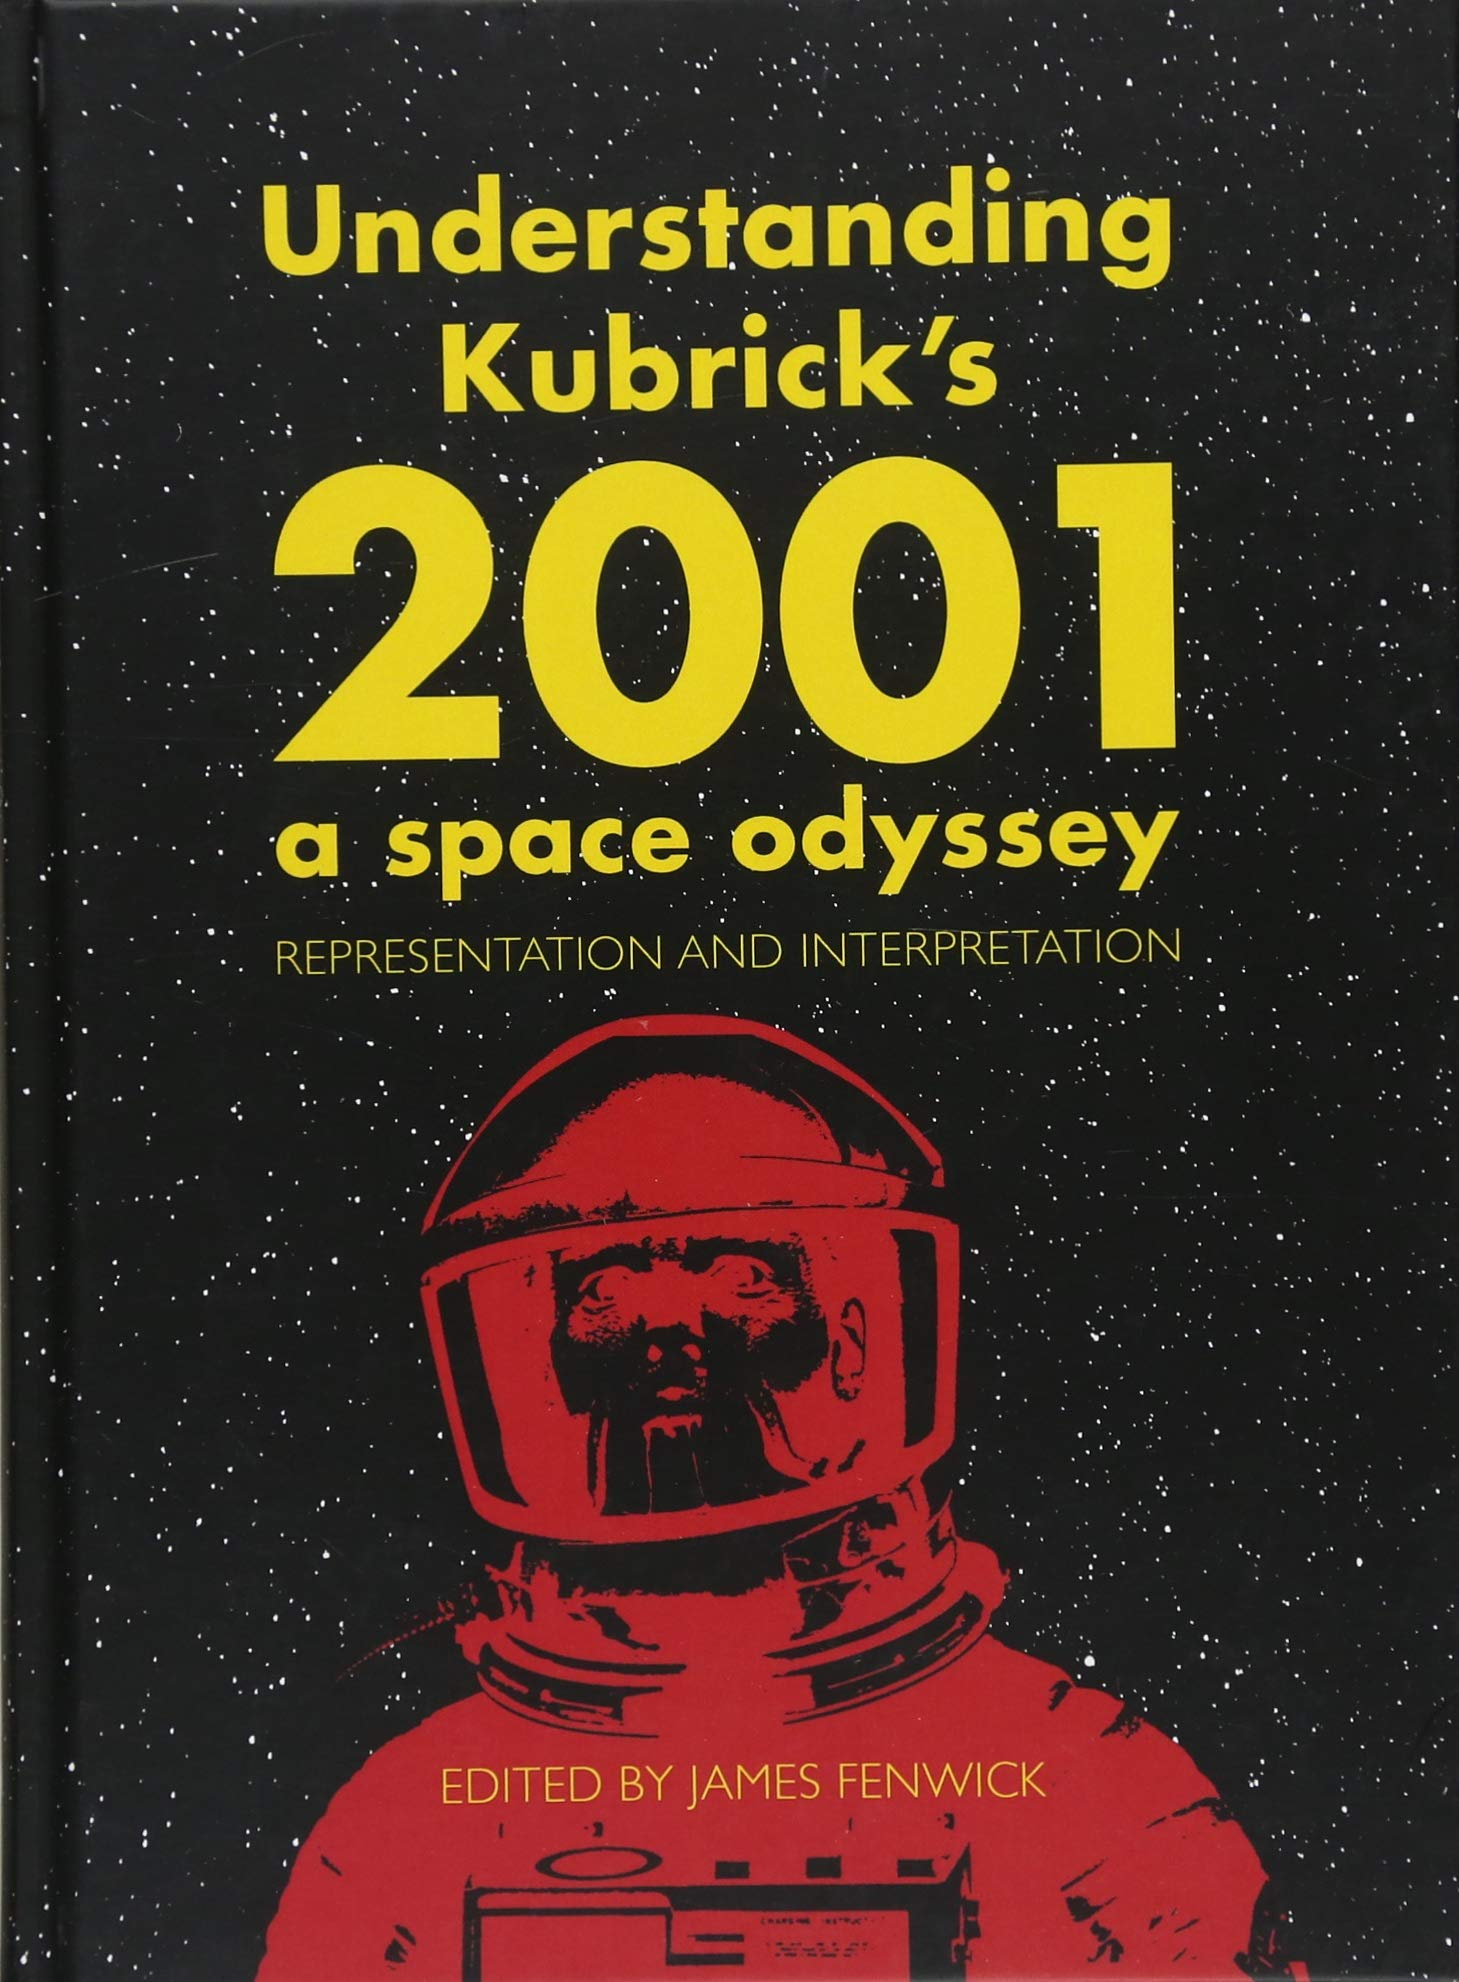 Understanding Kubrick's 2001: A Space Odyssey: Representation and Interpretation ebook